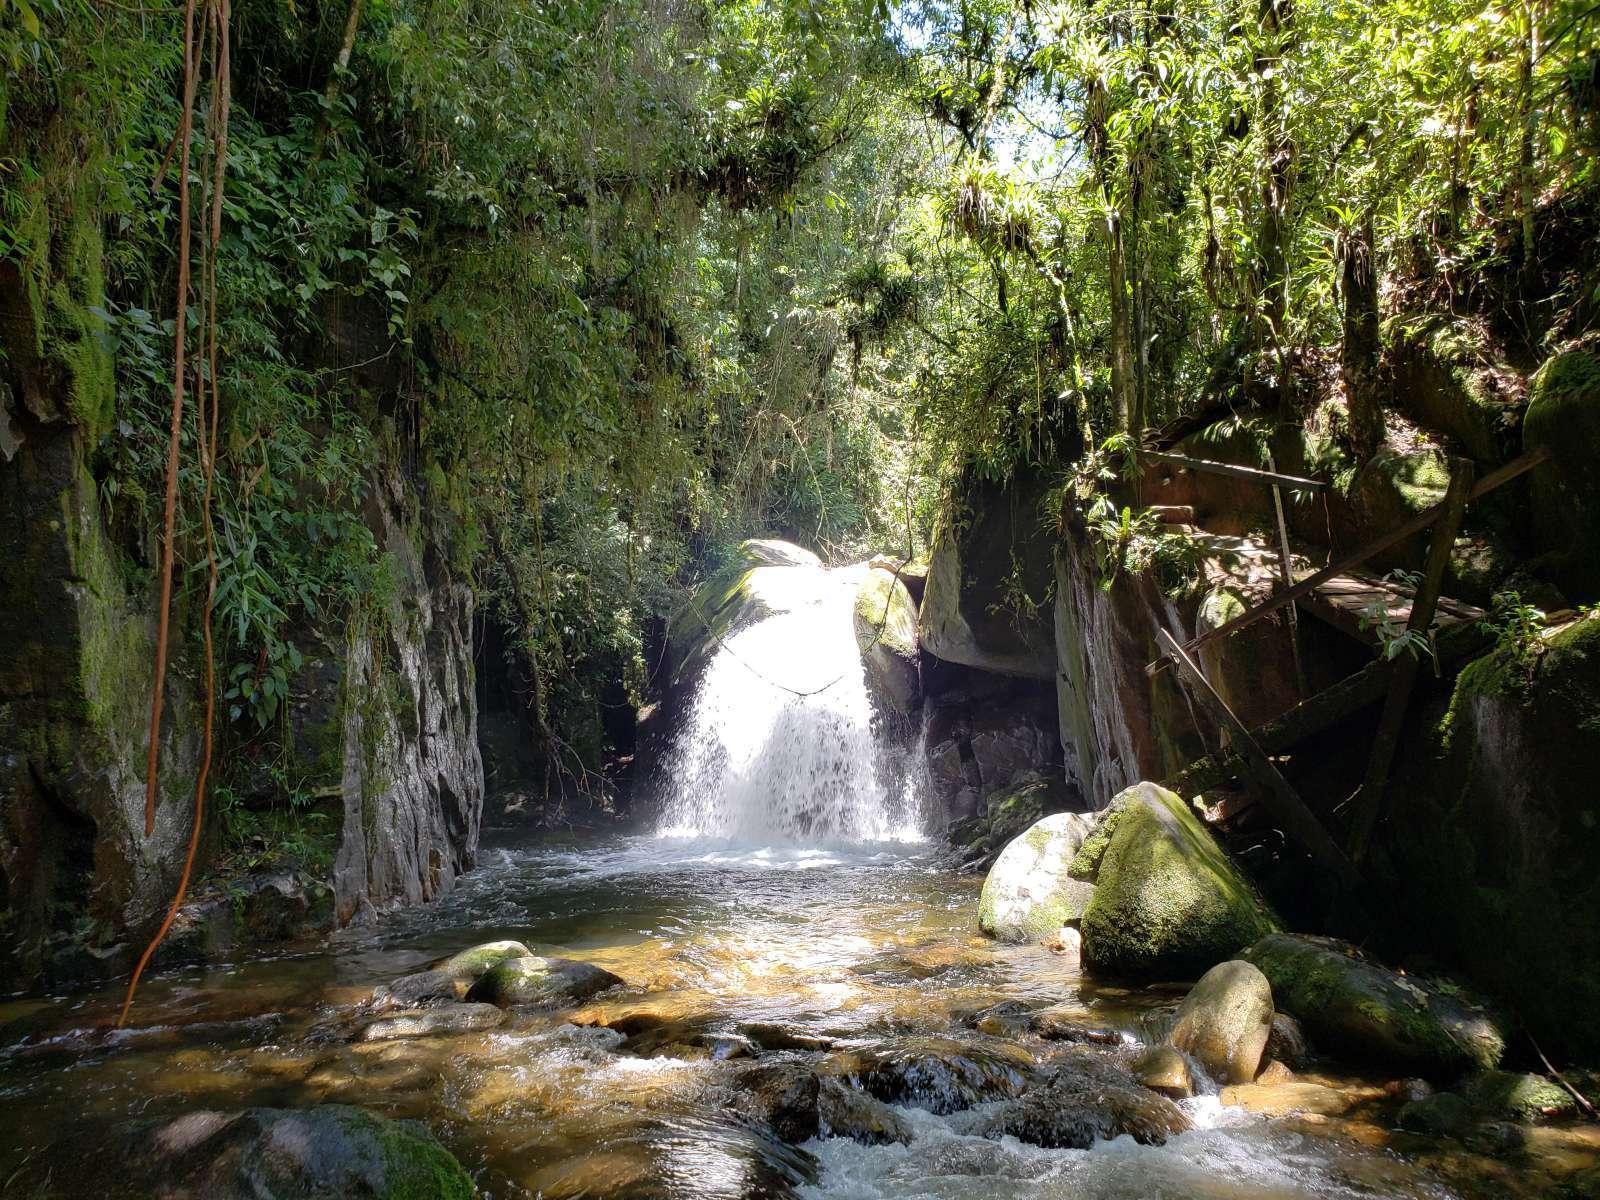 Cachoeira Toca da Raposa